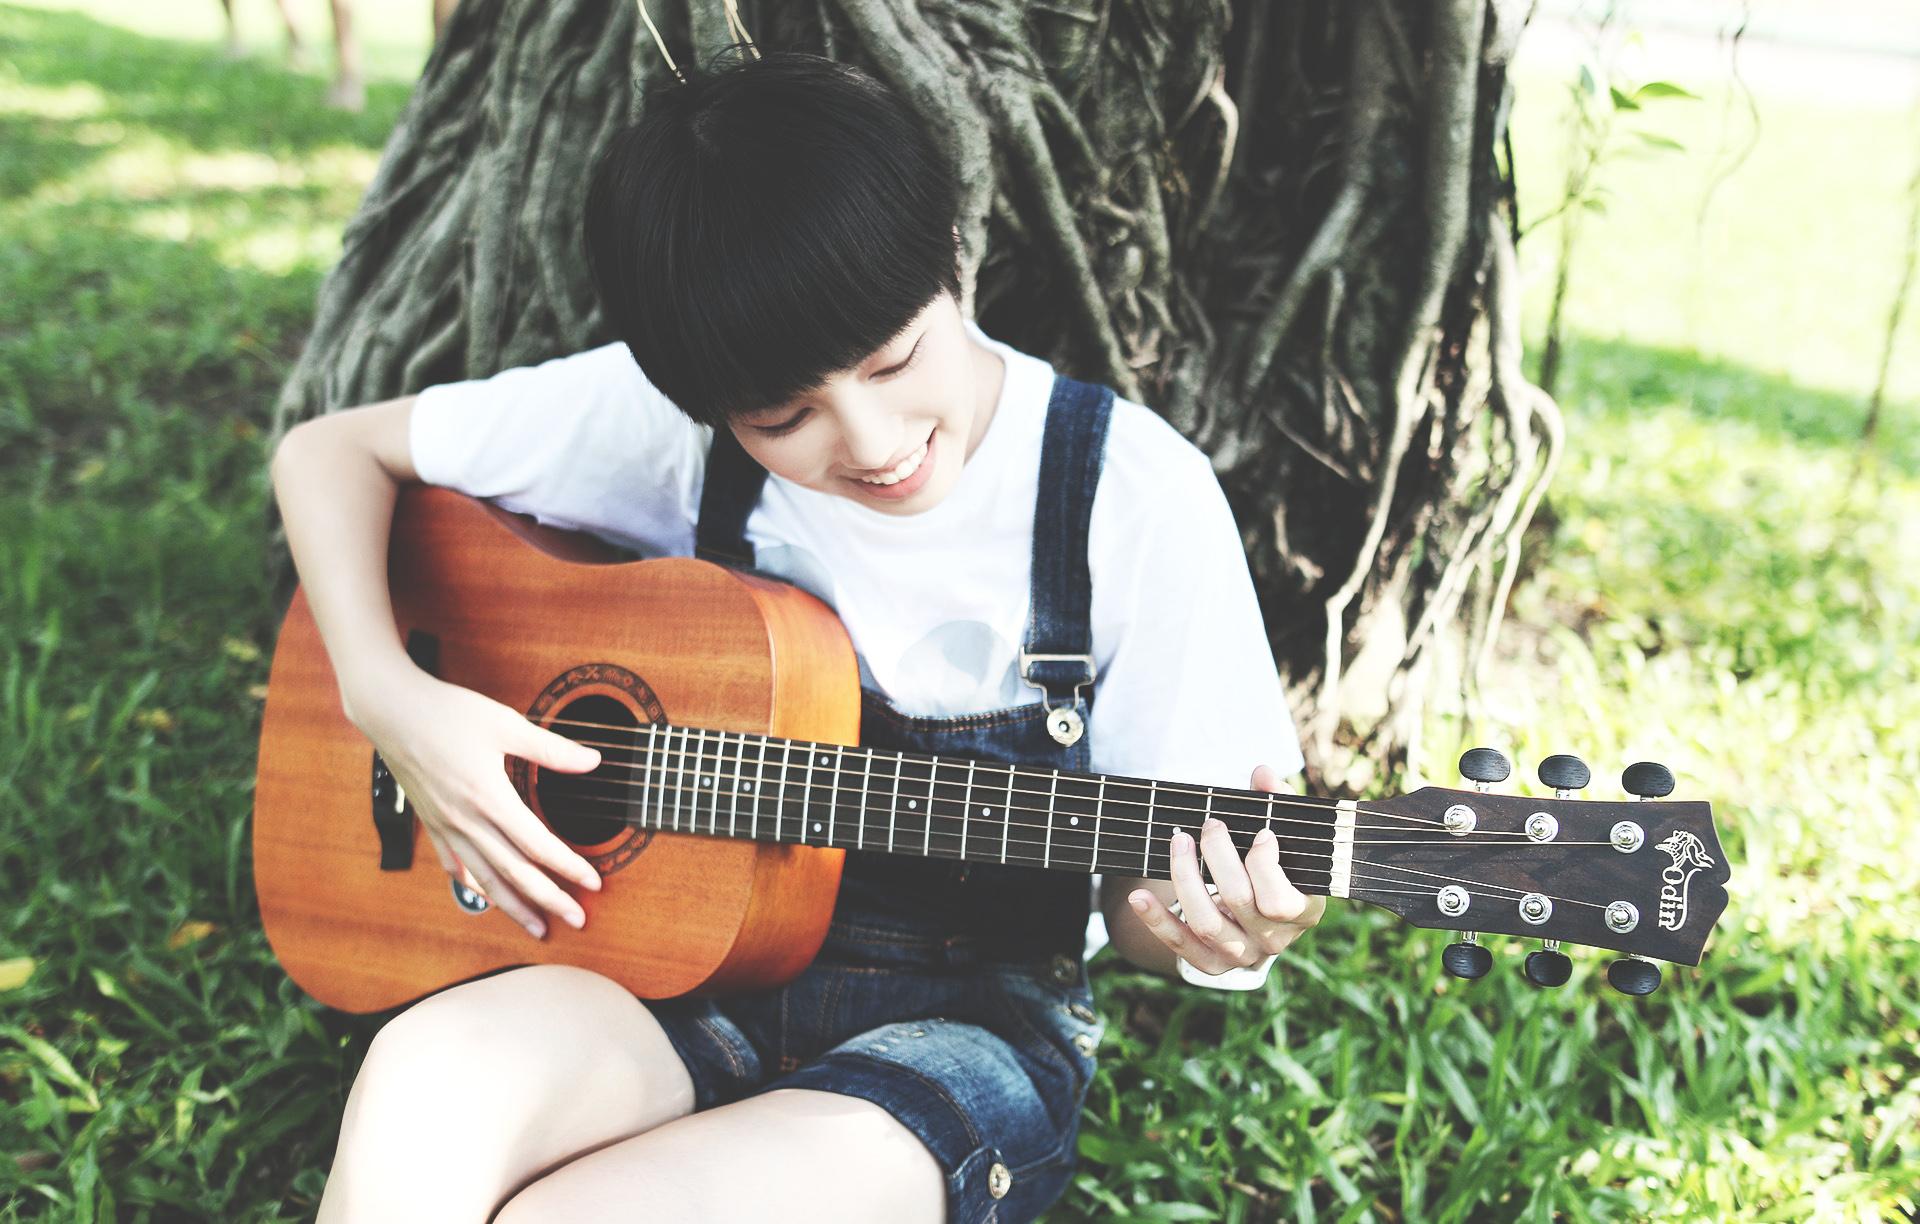 guitar-2422149_1920.jpg